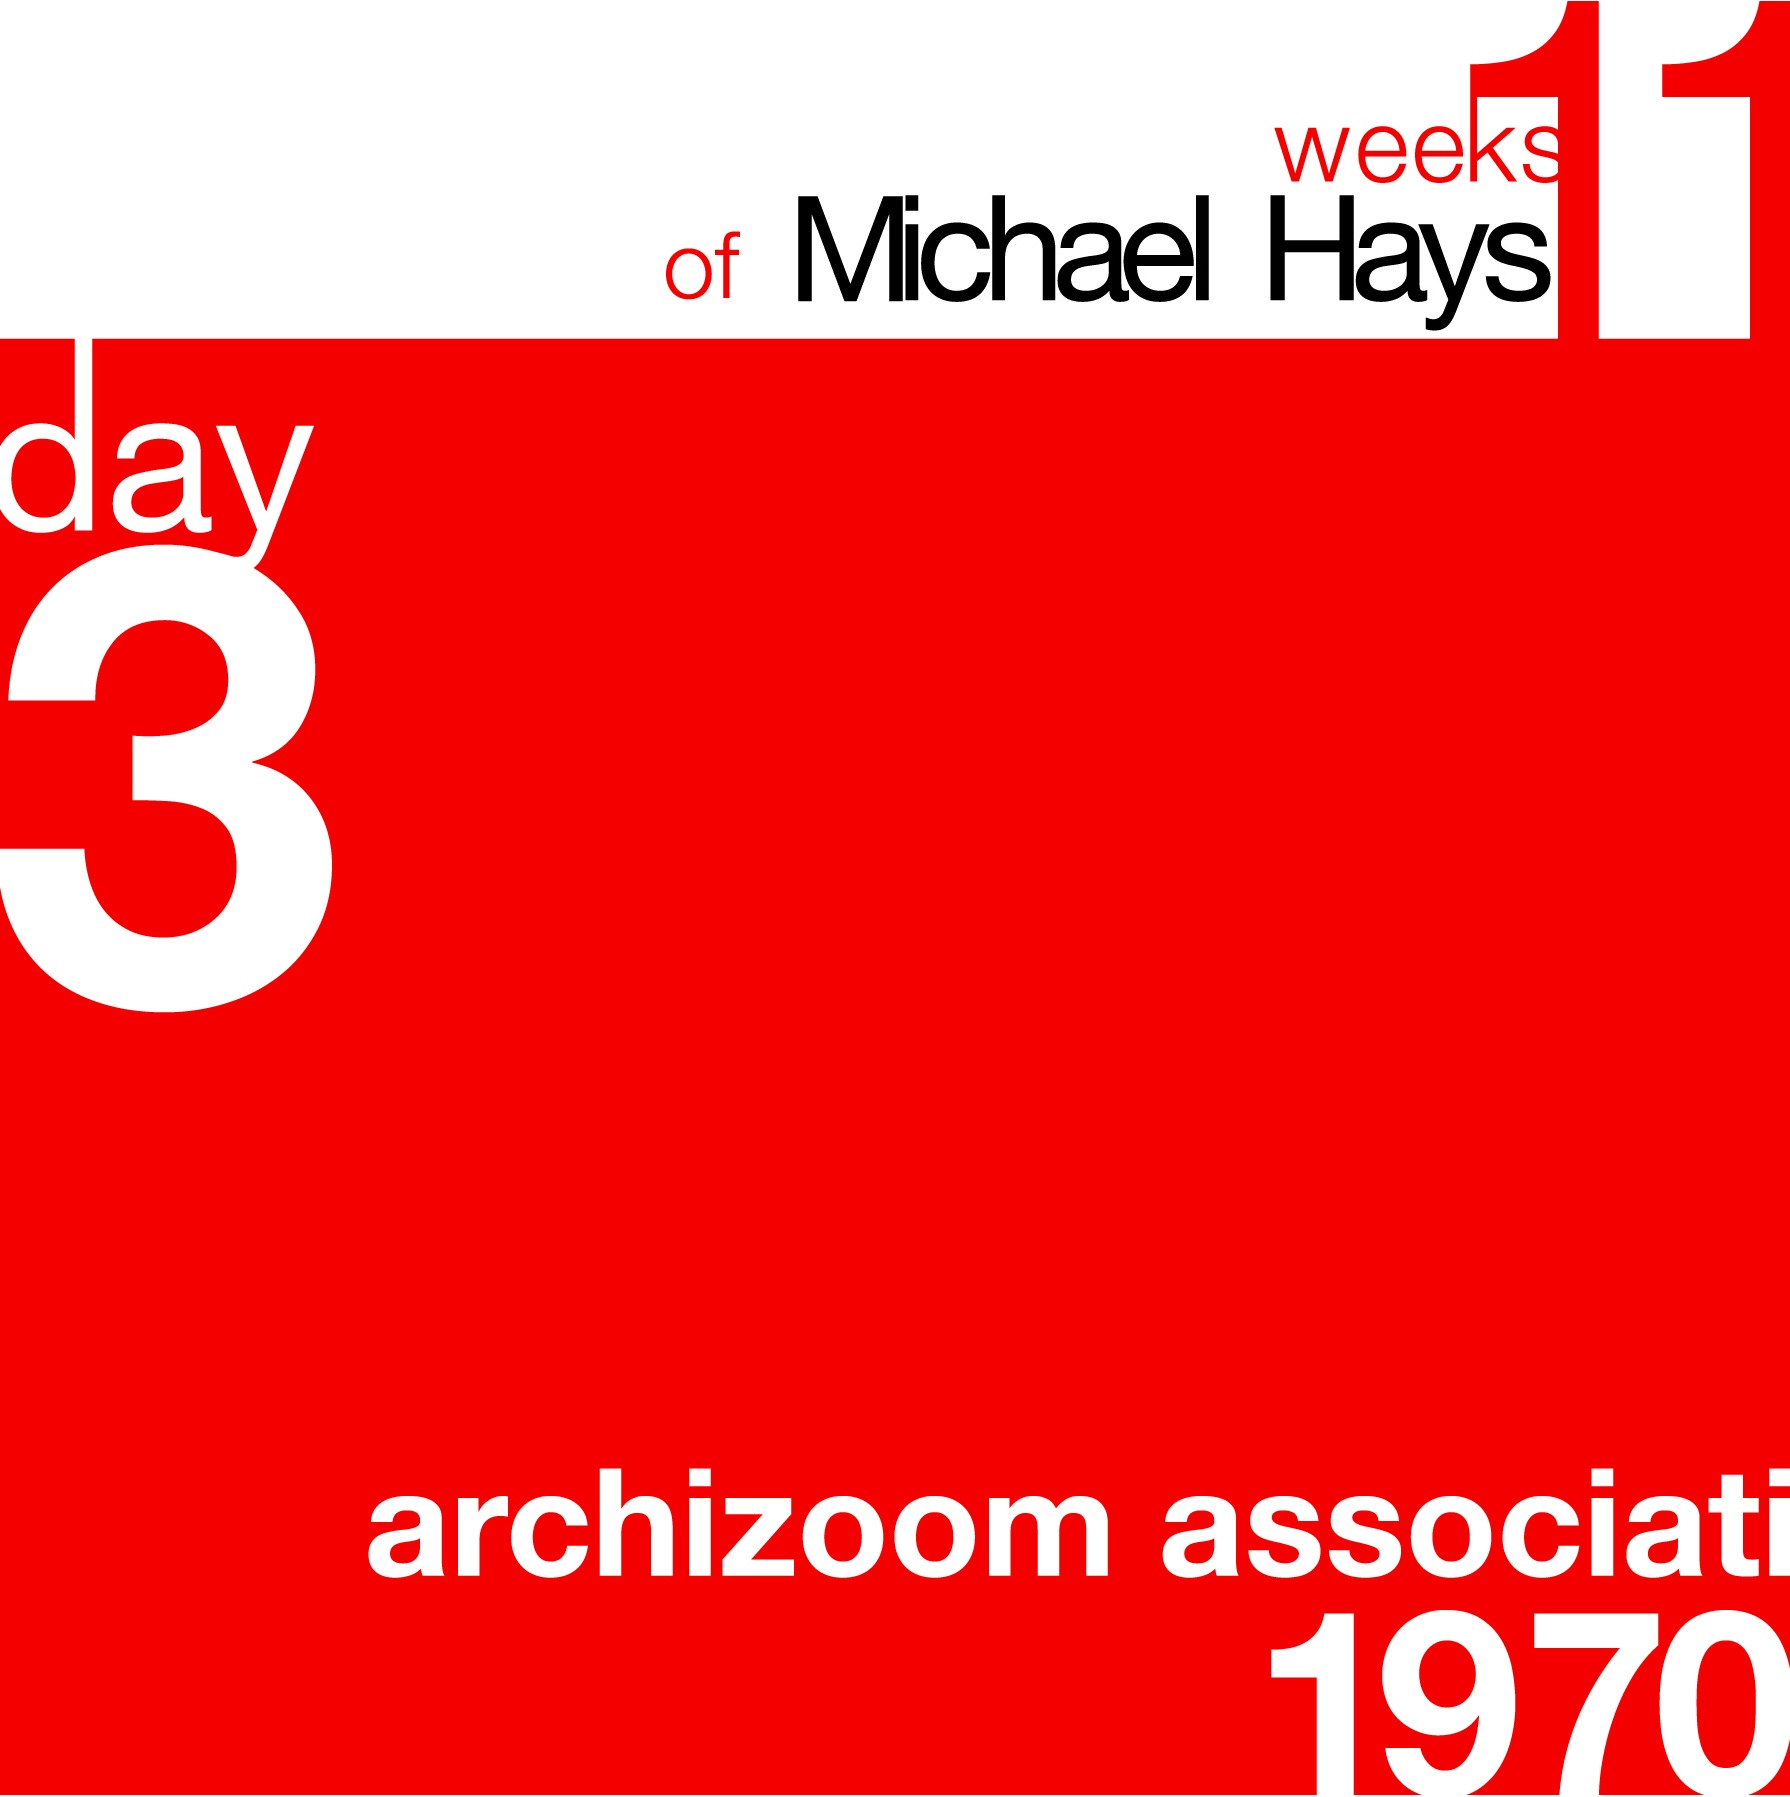 3_1970_archizoom associati.jpg